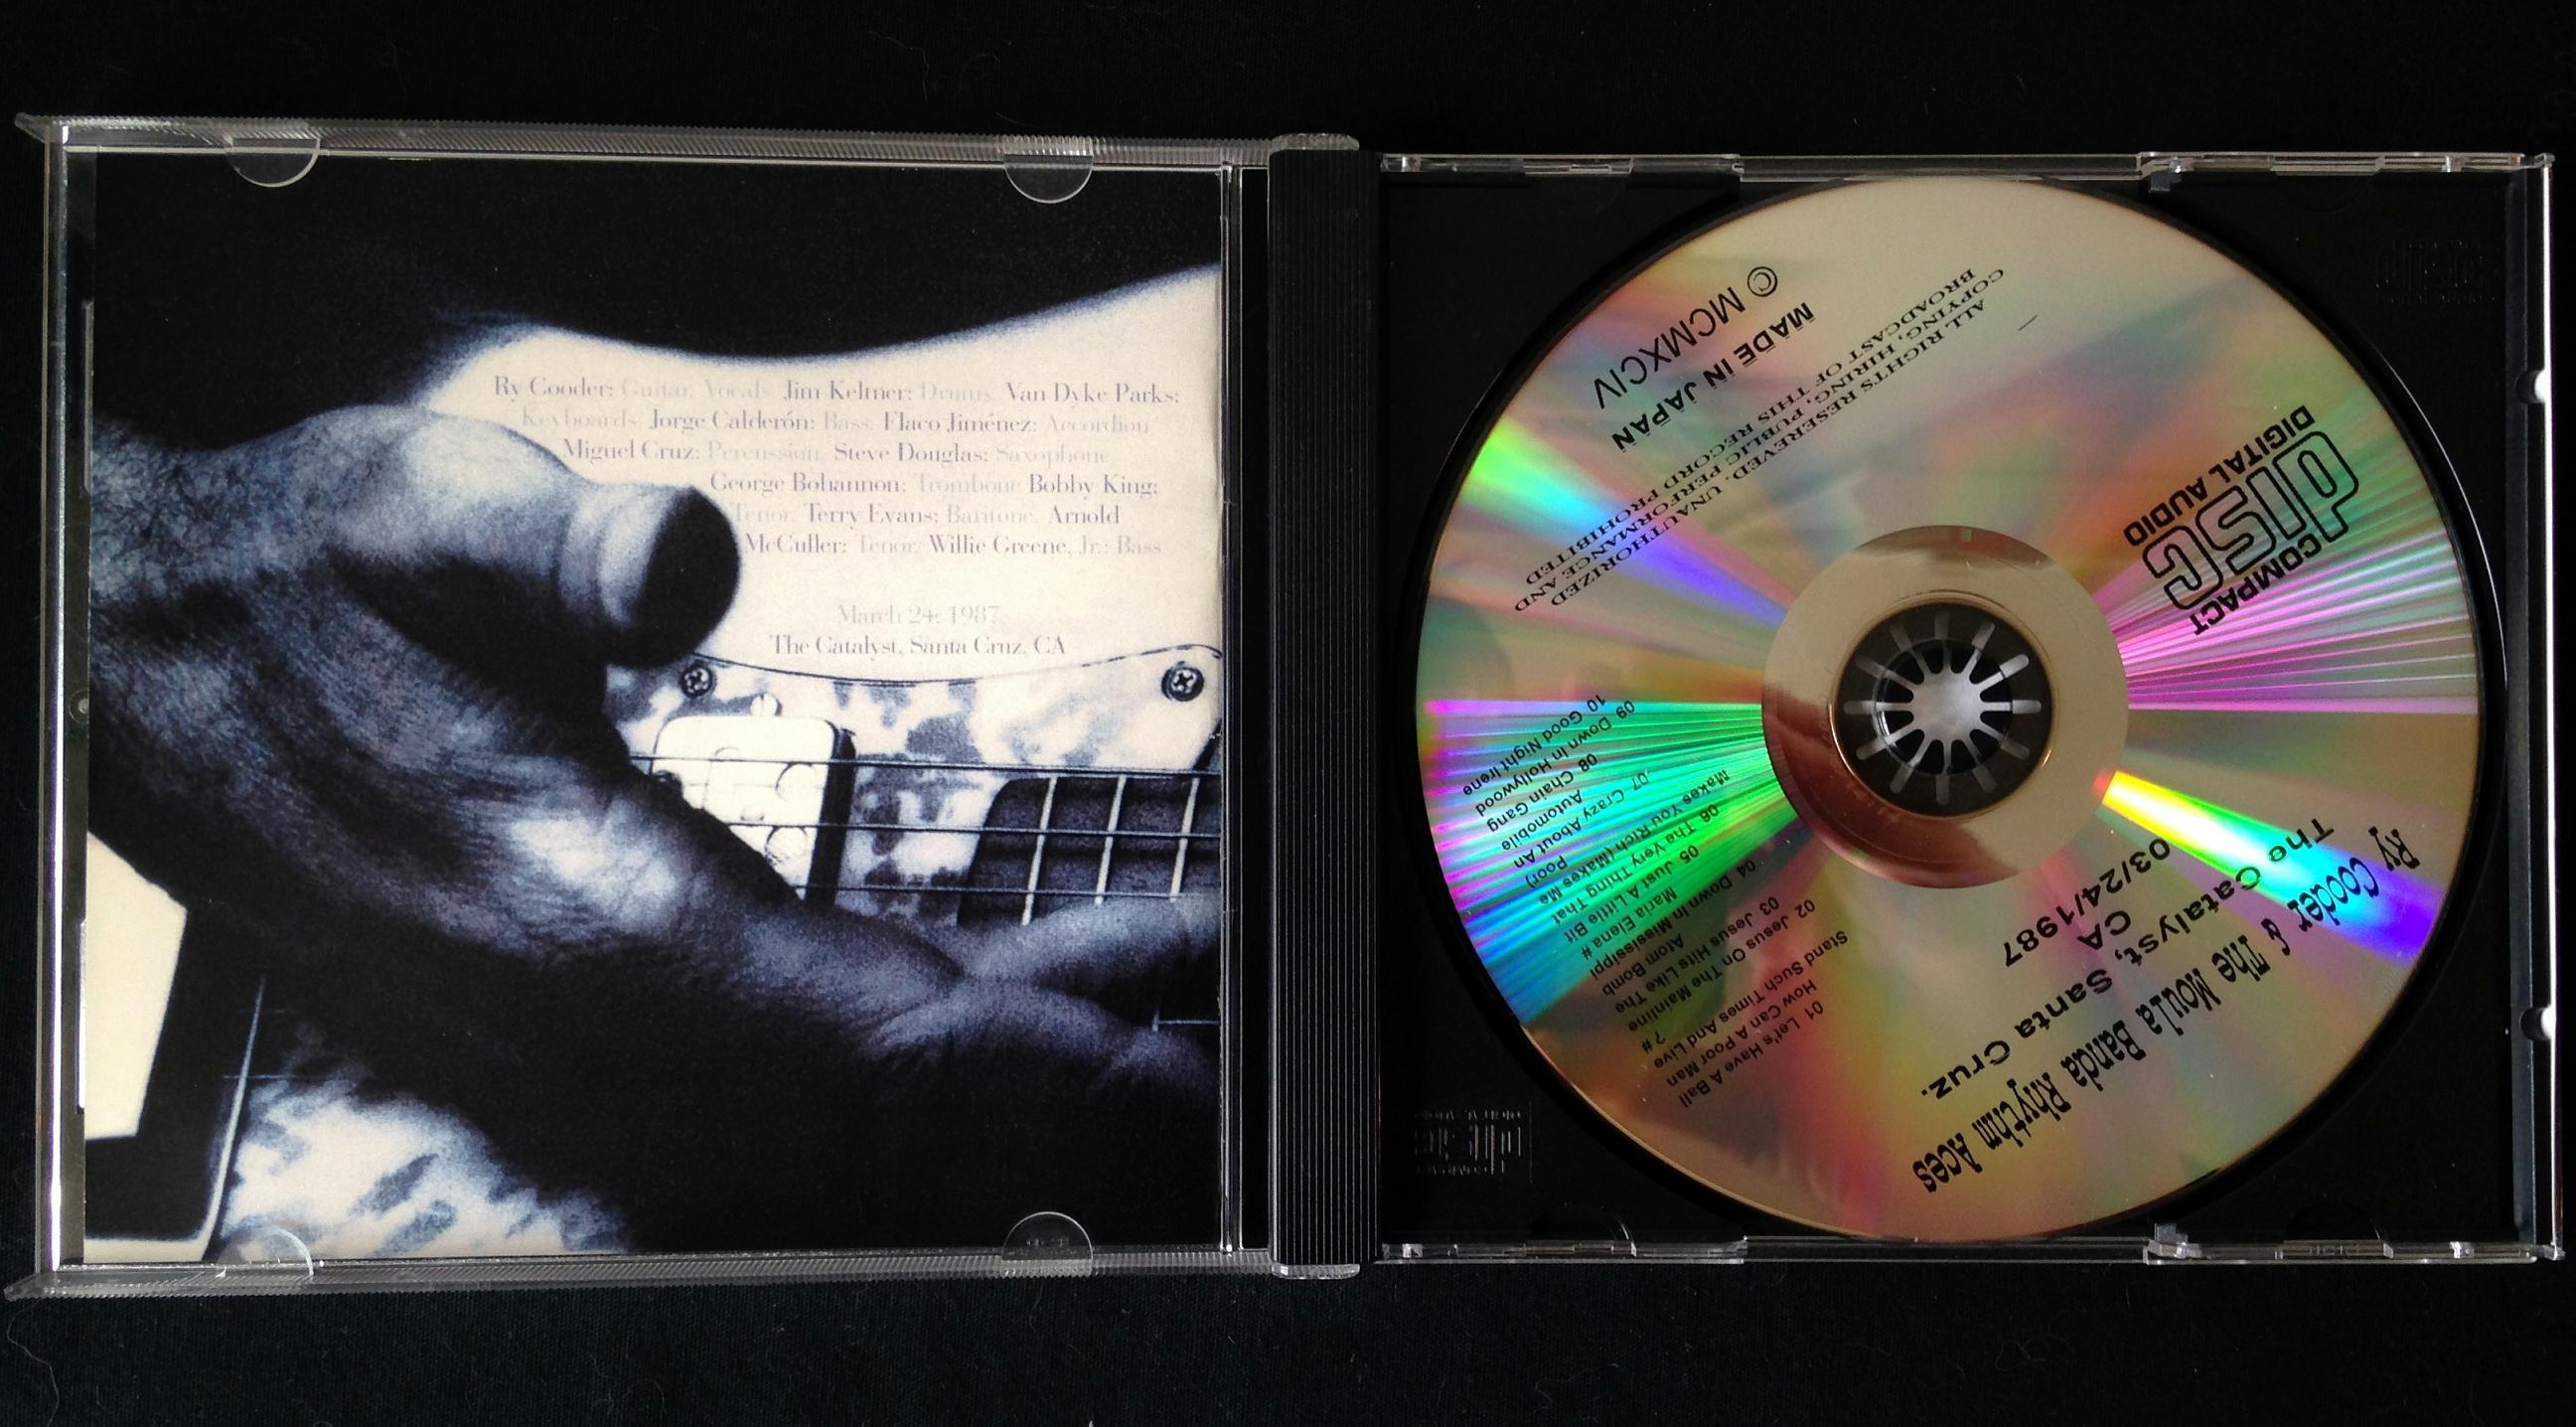 Ry Cooder and the Moula Banda Rhythm Aces CD (3)